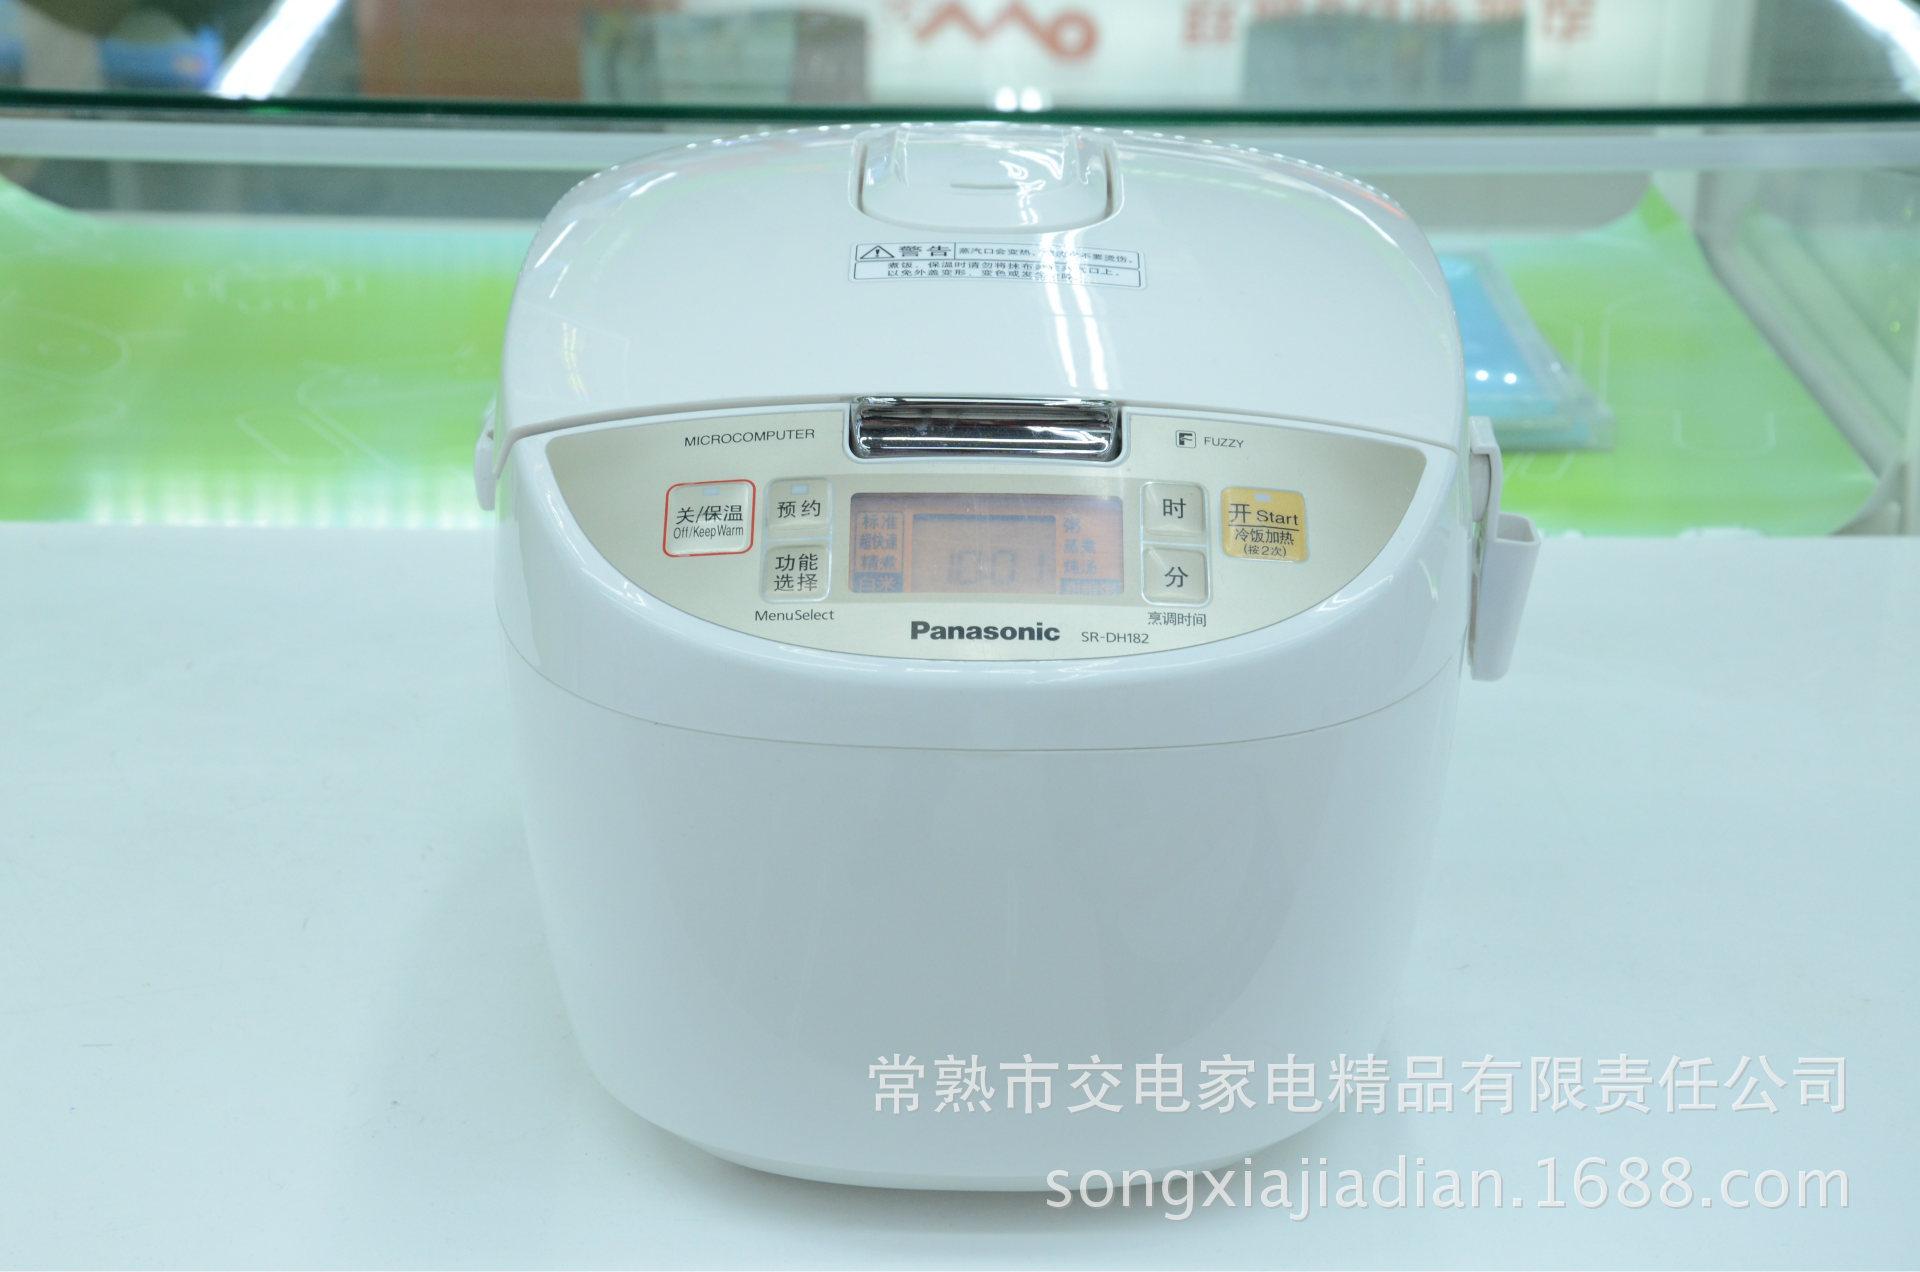 【Panasonic/松下SR-DH182备长图纸锅电k8什么意思炭黑图片